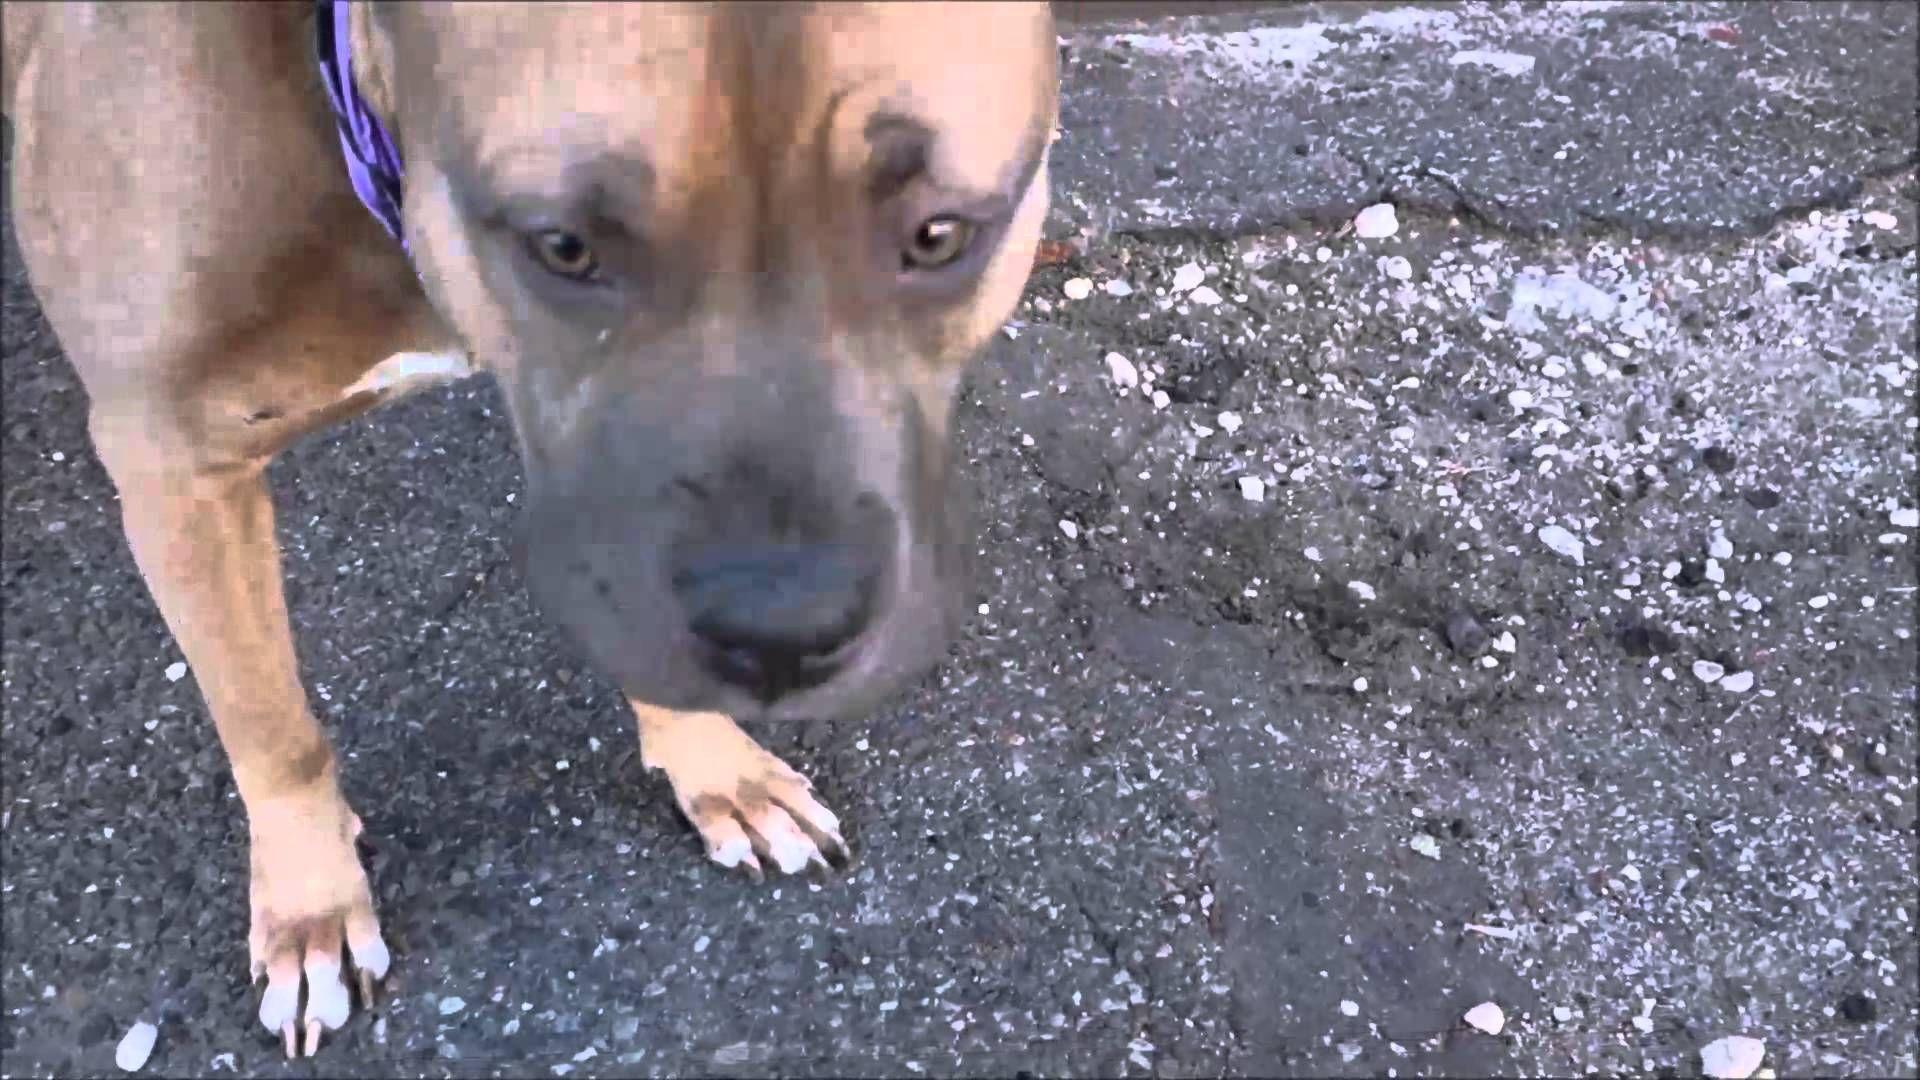 Brooklyn Center DYLAN A0995589 No kill animal shelter